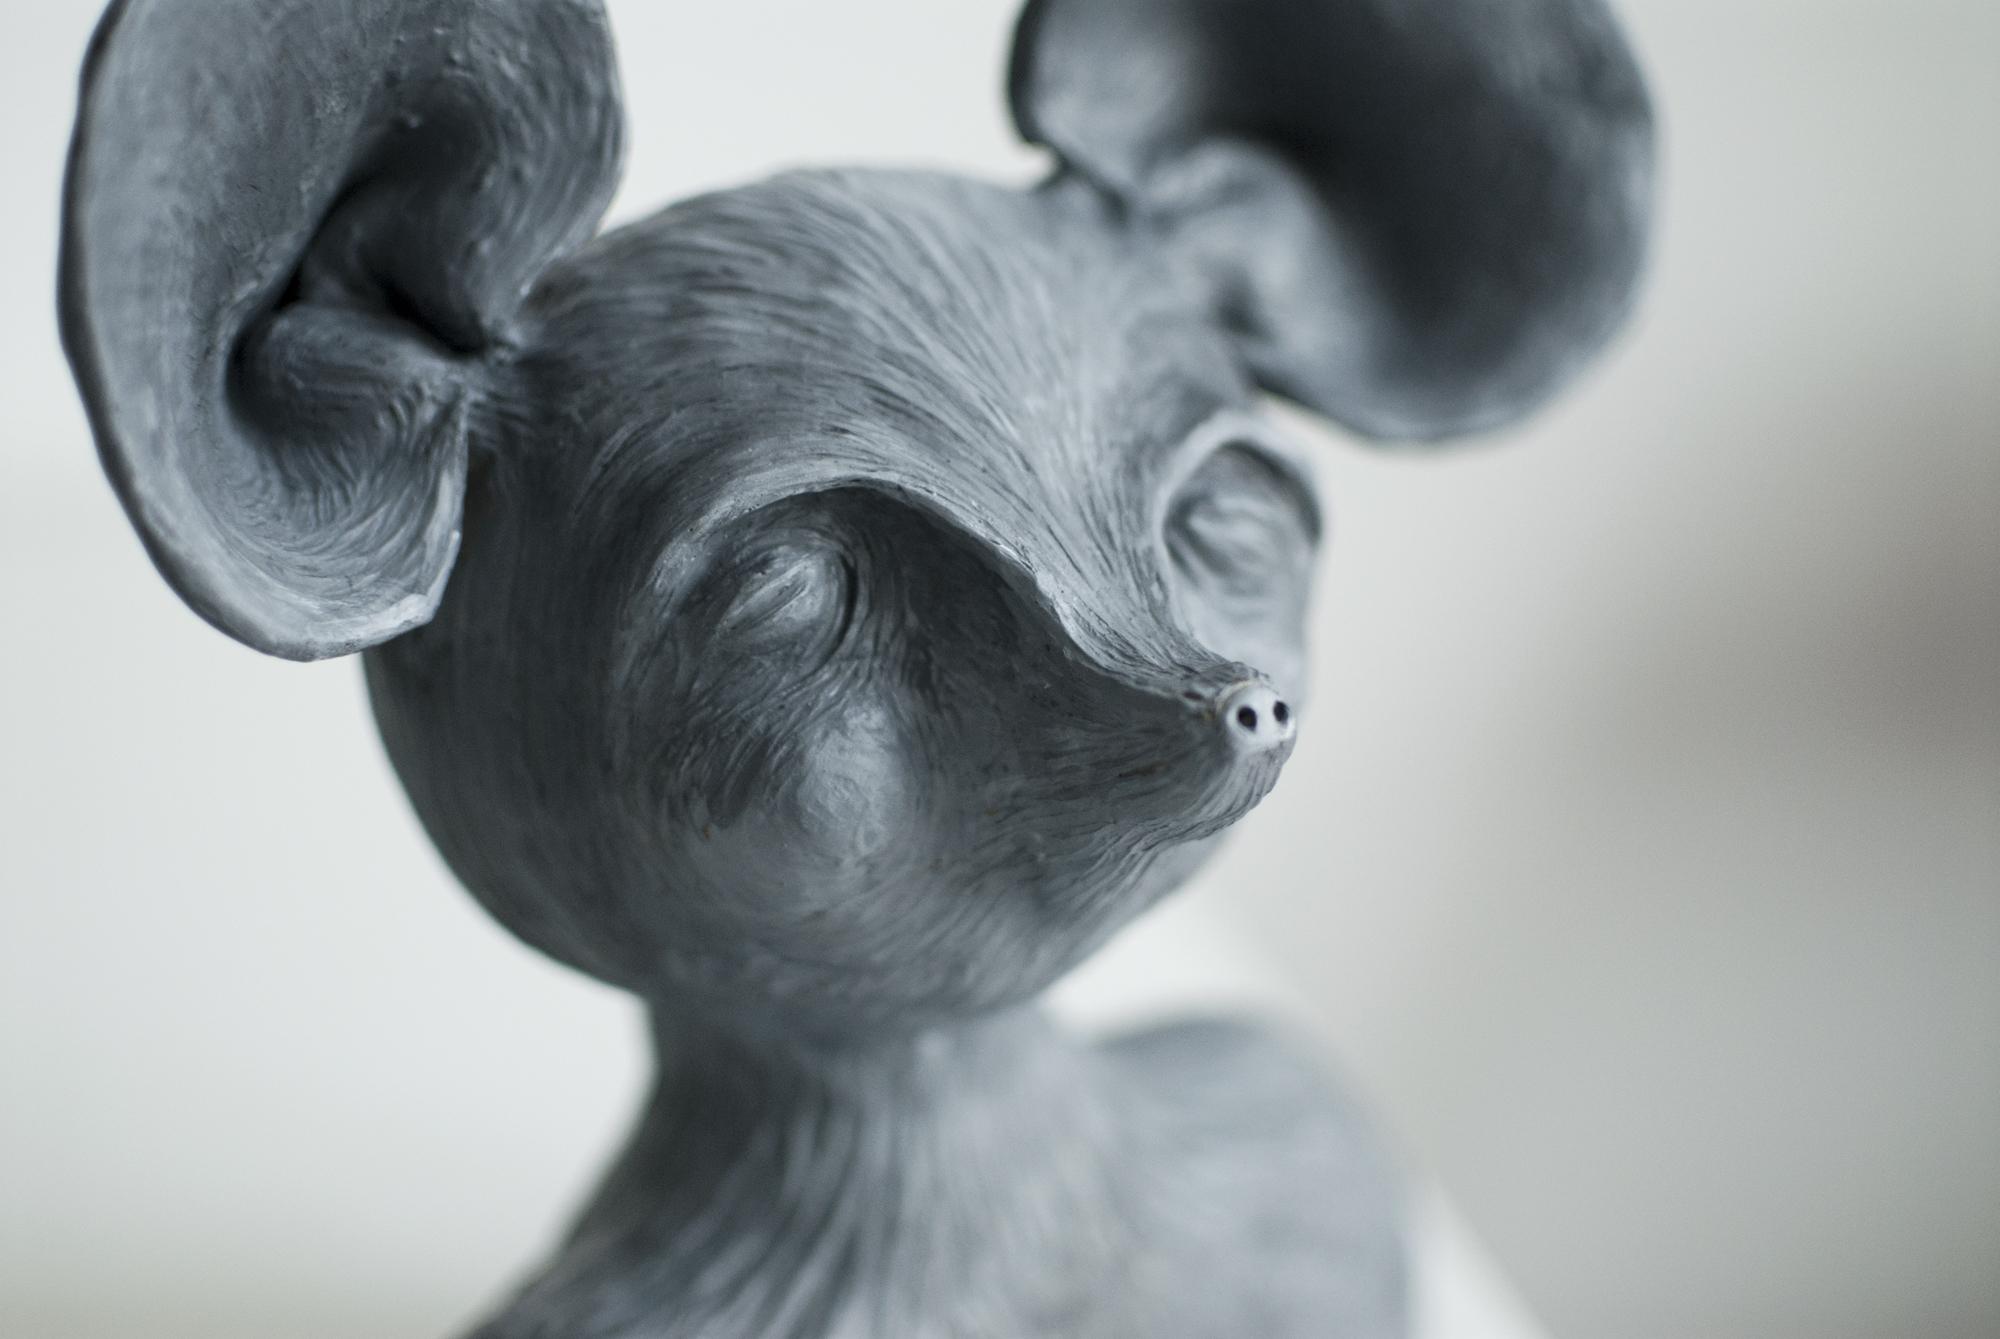 A newborn mouse!